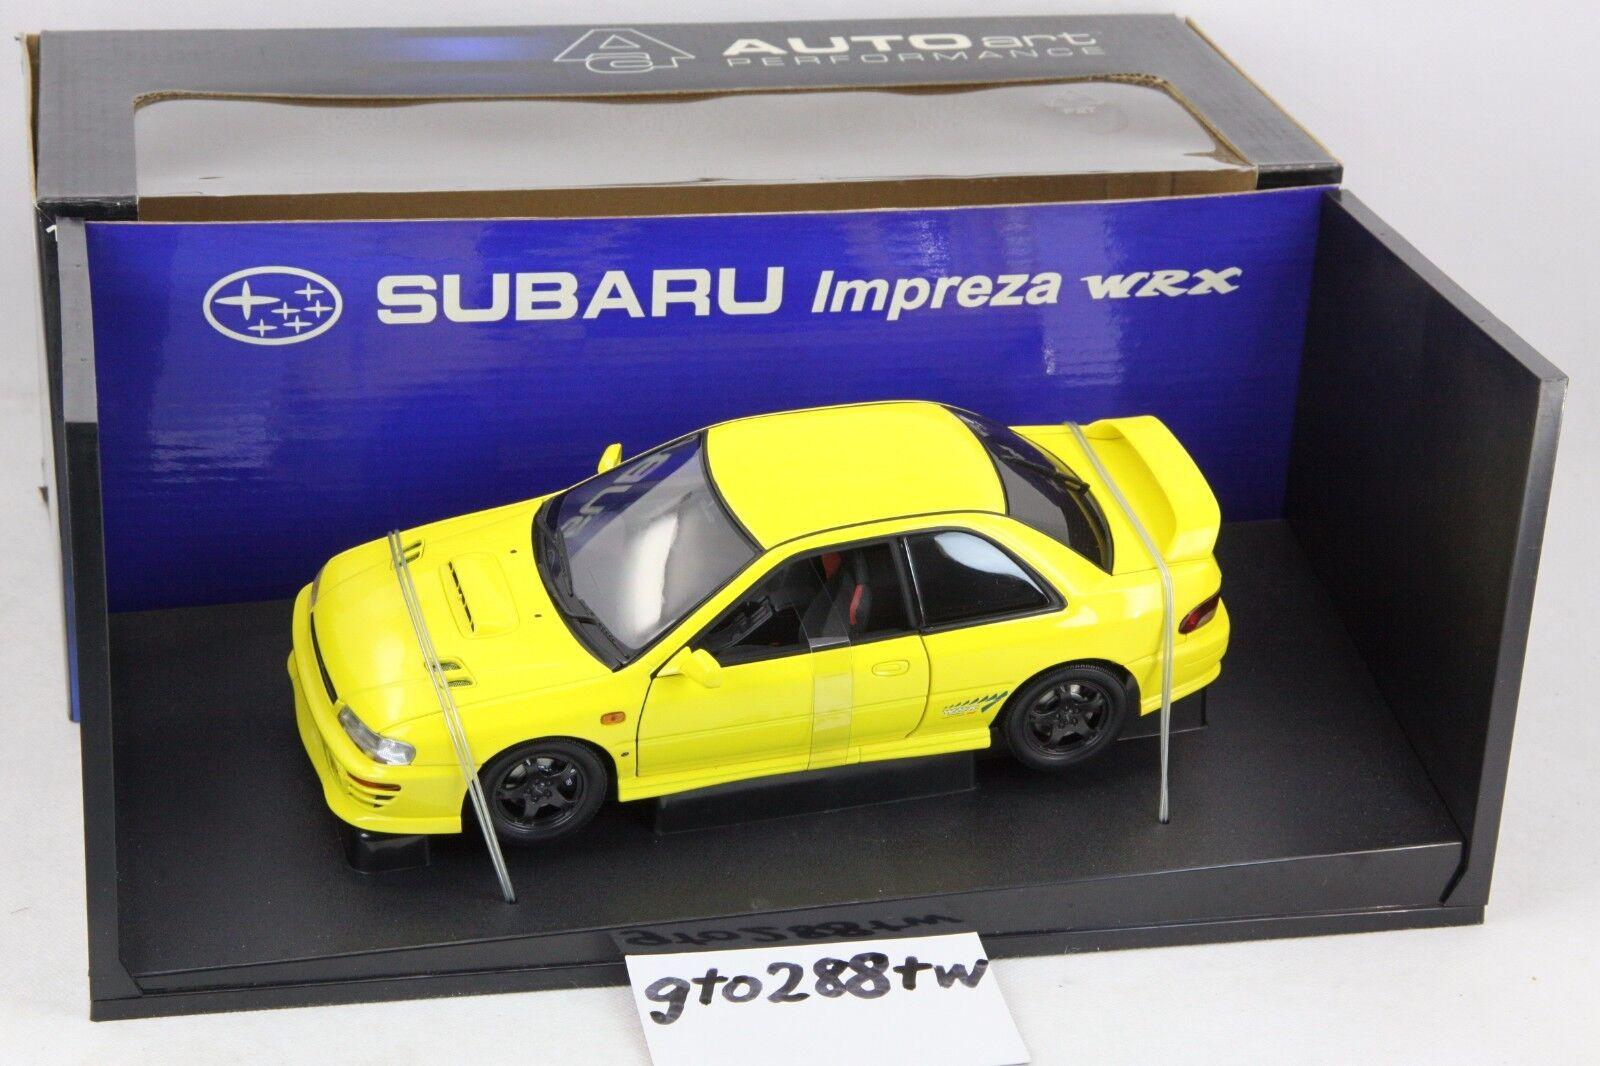 Autoart 1 18 Scale SUBARU IMPREZA WRX TYPE  R GC8 (jaune) 78611 rare nouveau IN BOX  le meilleur service après-vente